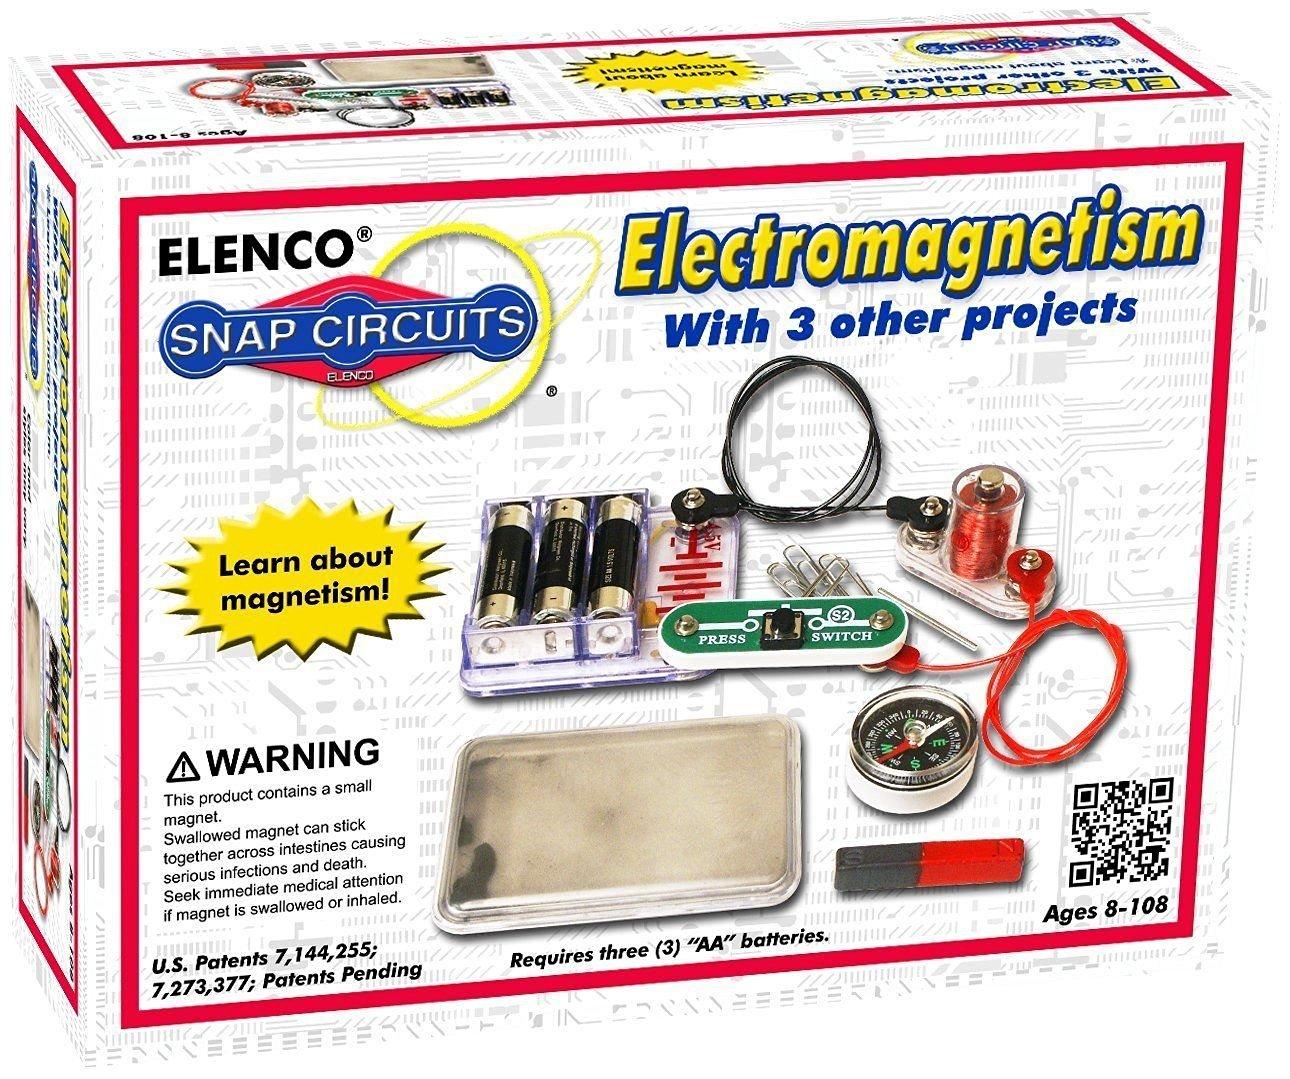 (USA Warehouse) ELENCO Snap Circuits SCP-08 Electromagnetism KitITEM#NO: 43E8E-UFE6 C2A9152